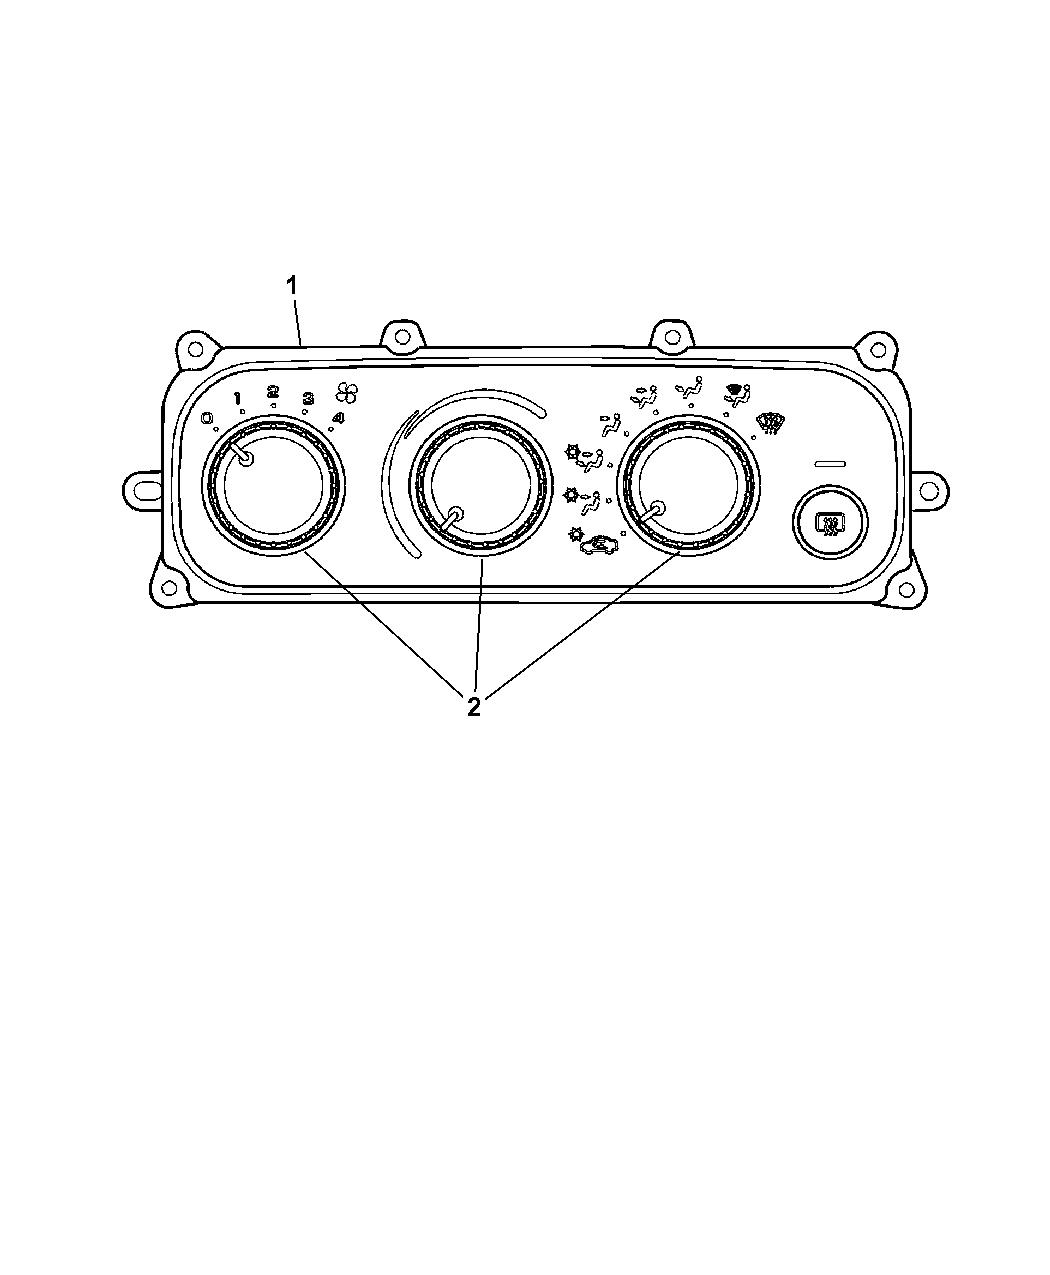 2001 Chrysler Sebring Sedan & Convertible Controls, A/C